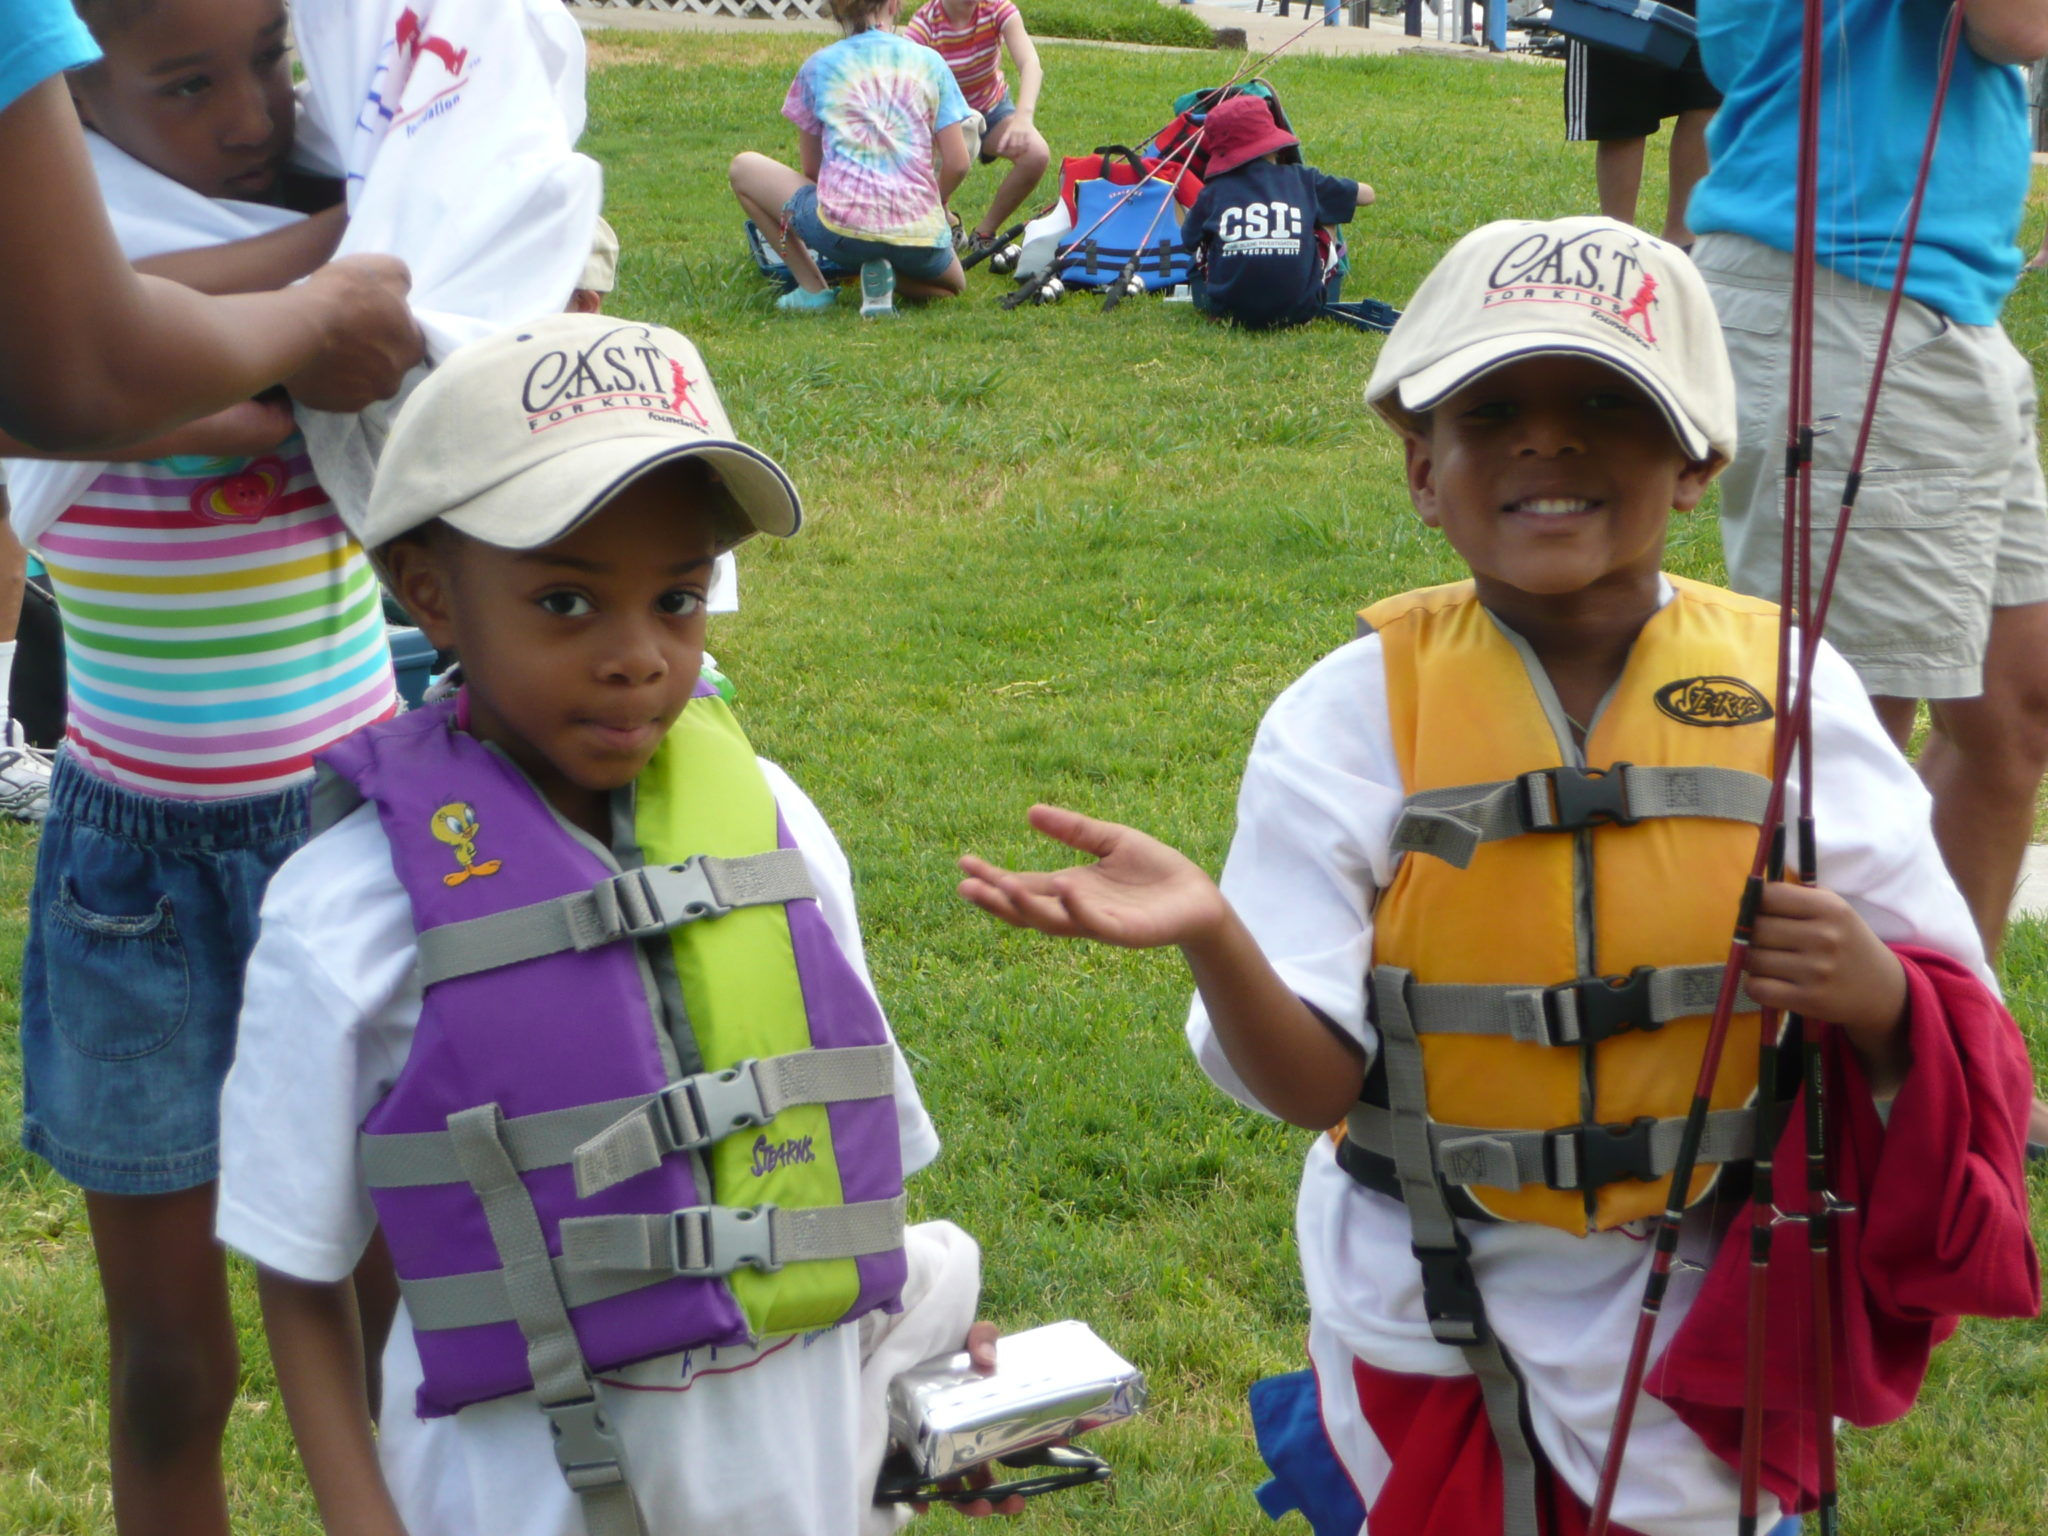 C.A.S.T. For Kids – Eagle Mountain Lake Presented By Texas Farm Bureau Insurance